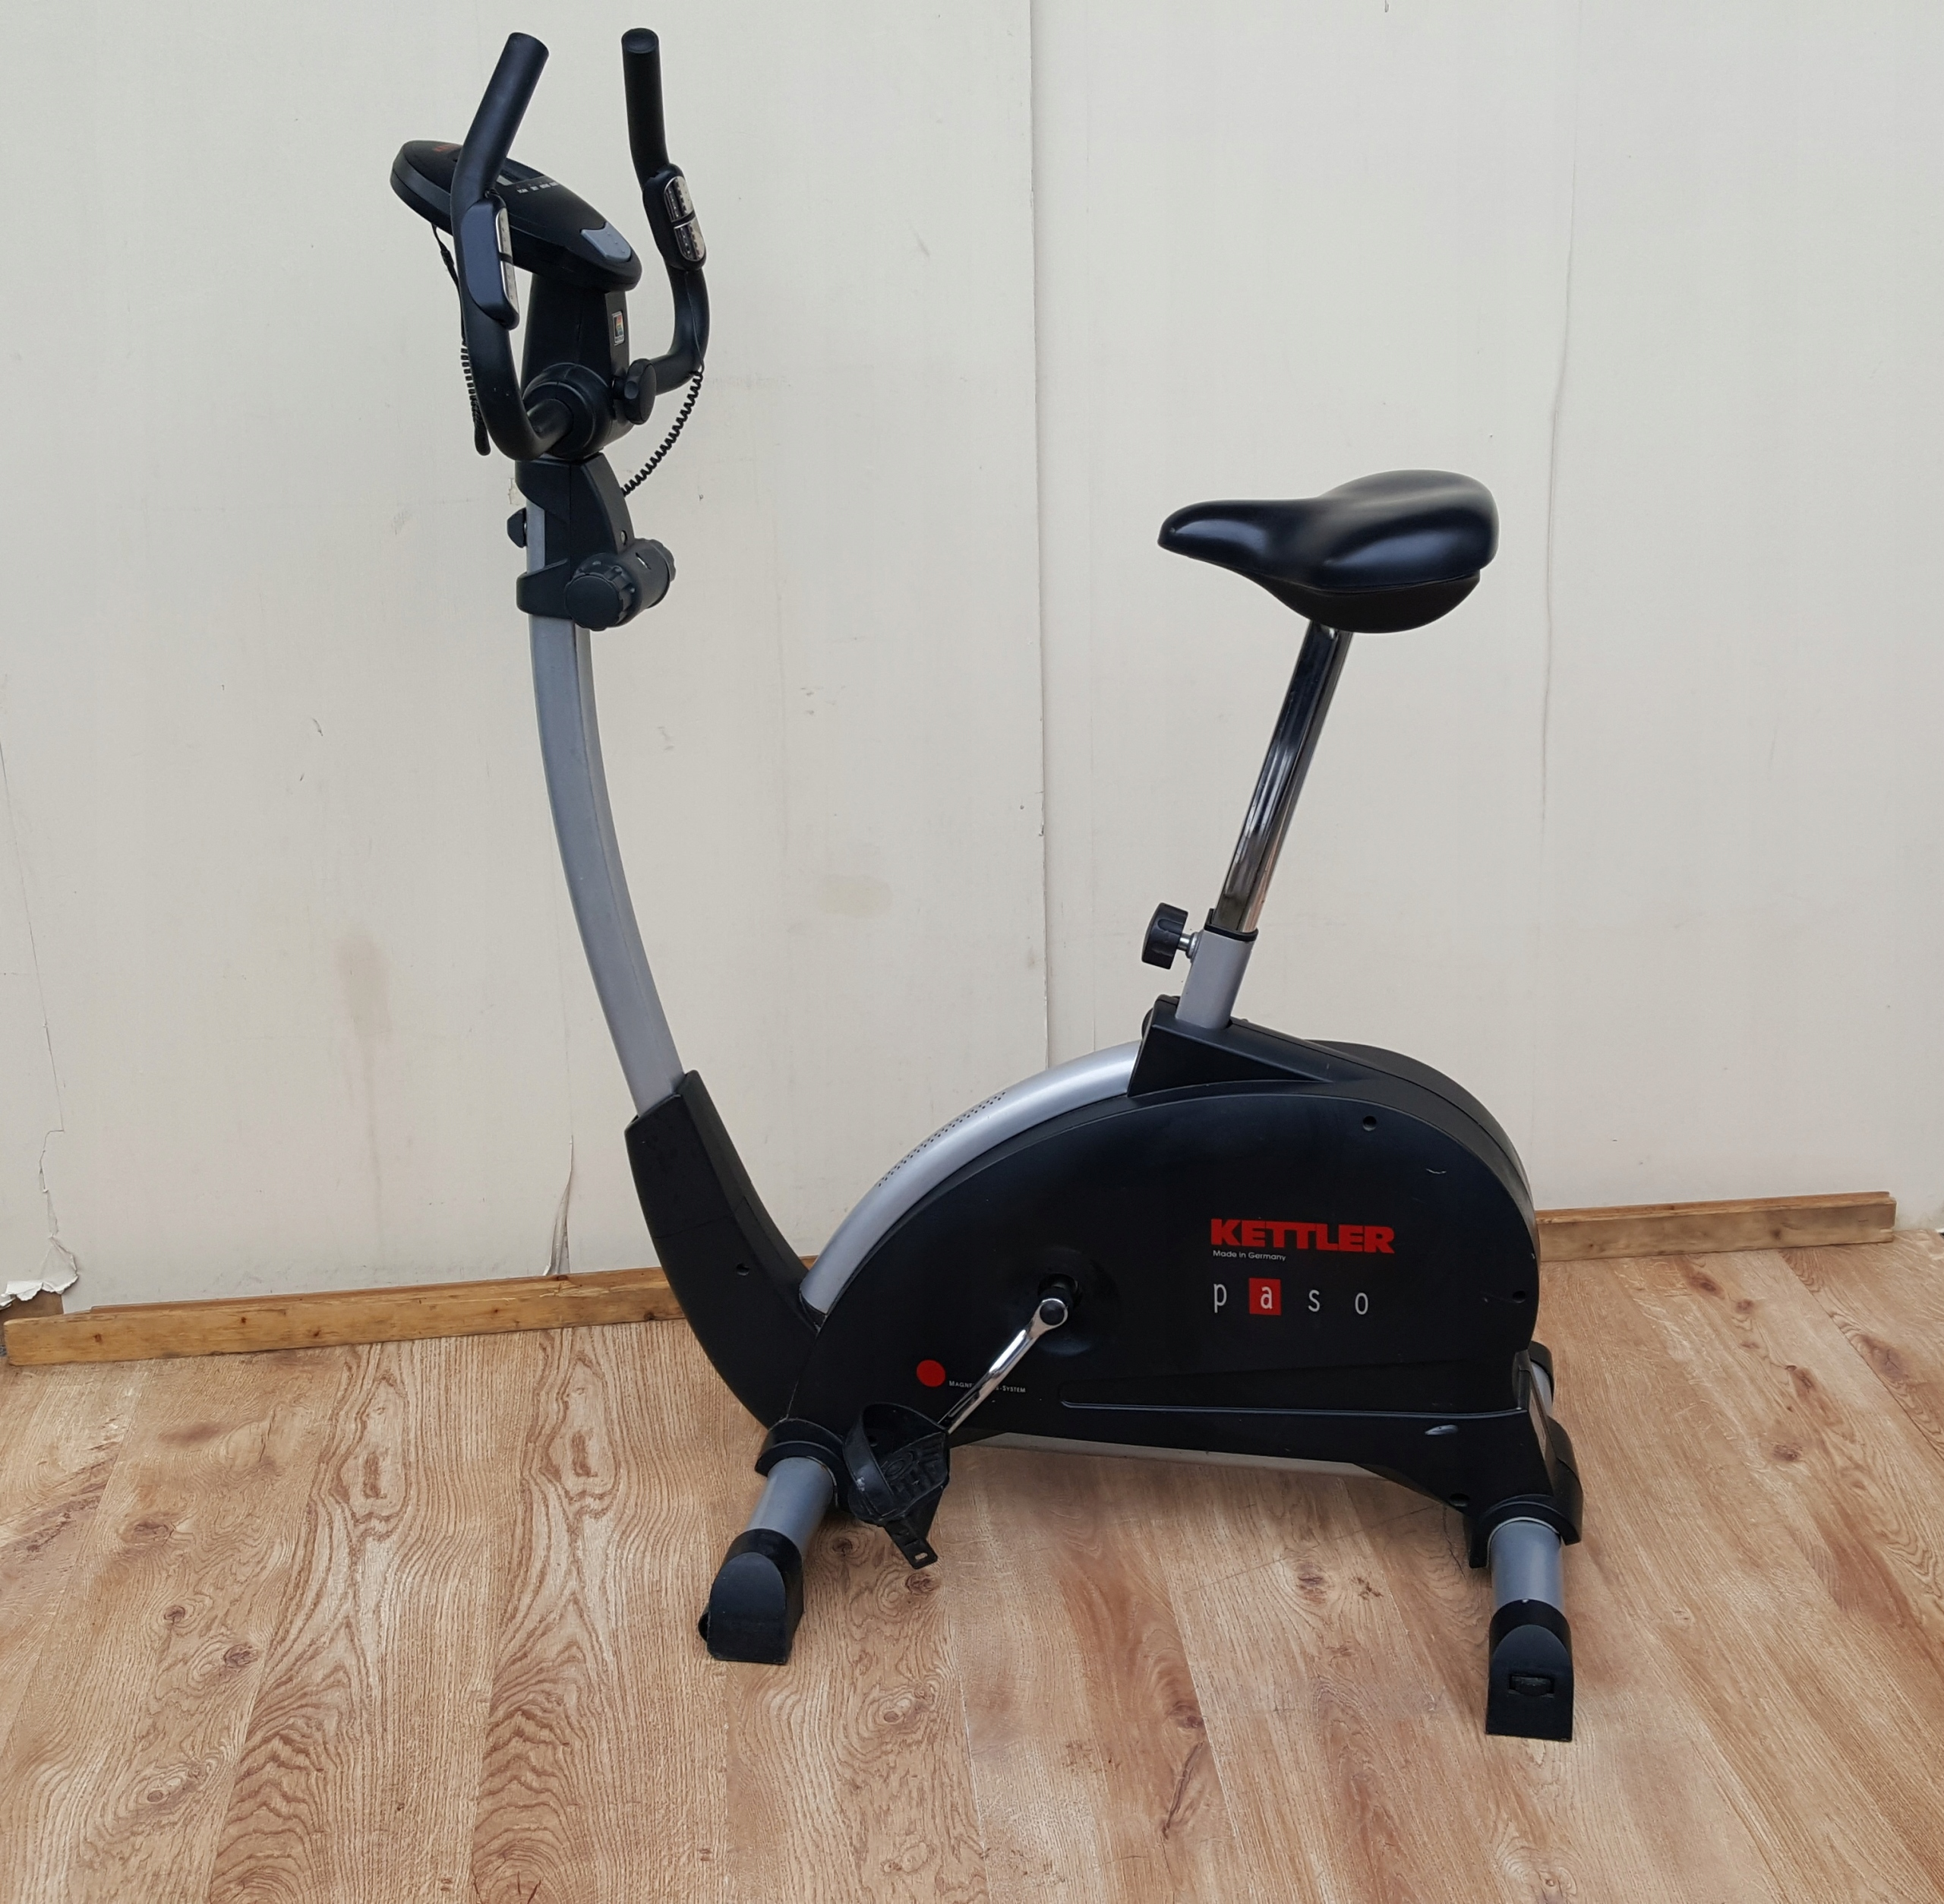 rowerek KETTLER paso koło 7 kg do 130 kg